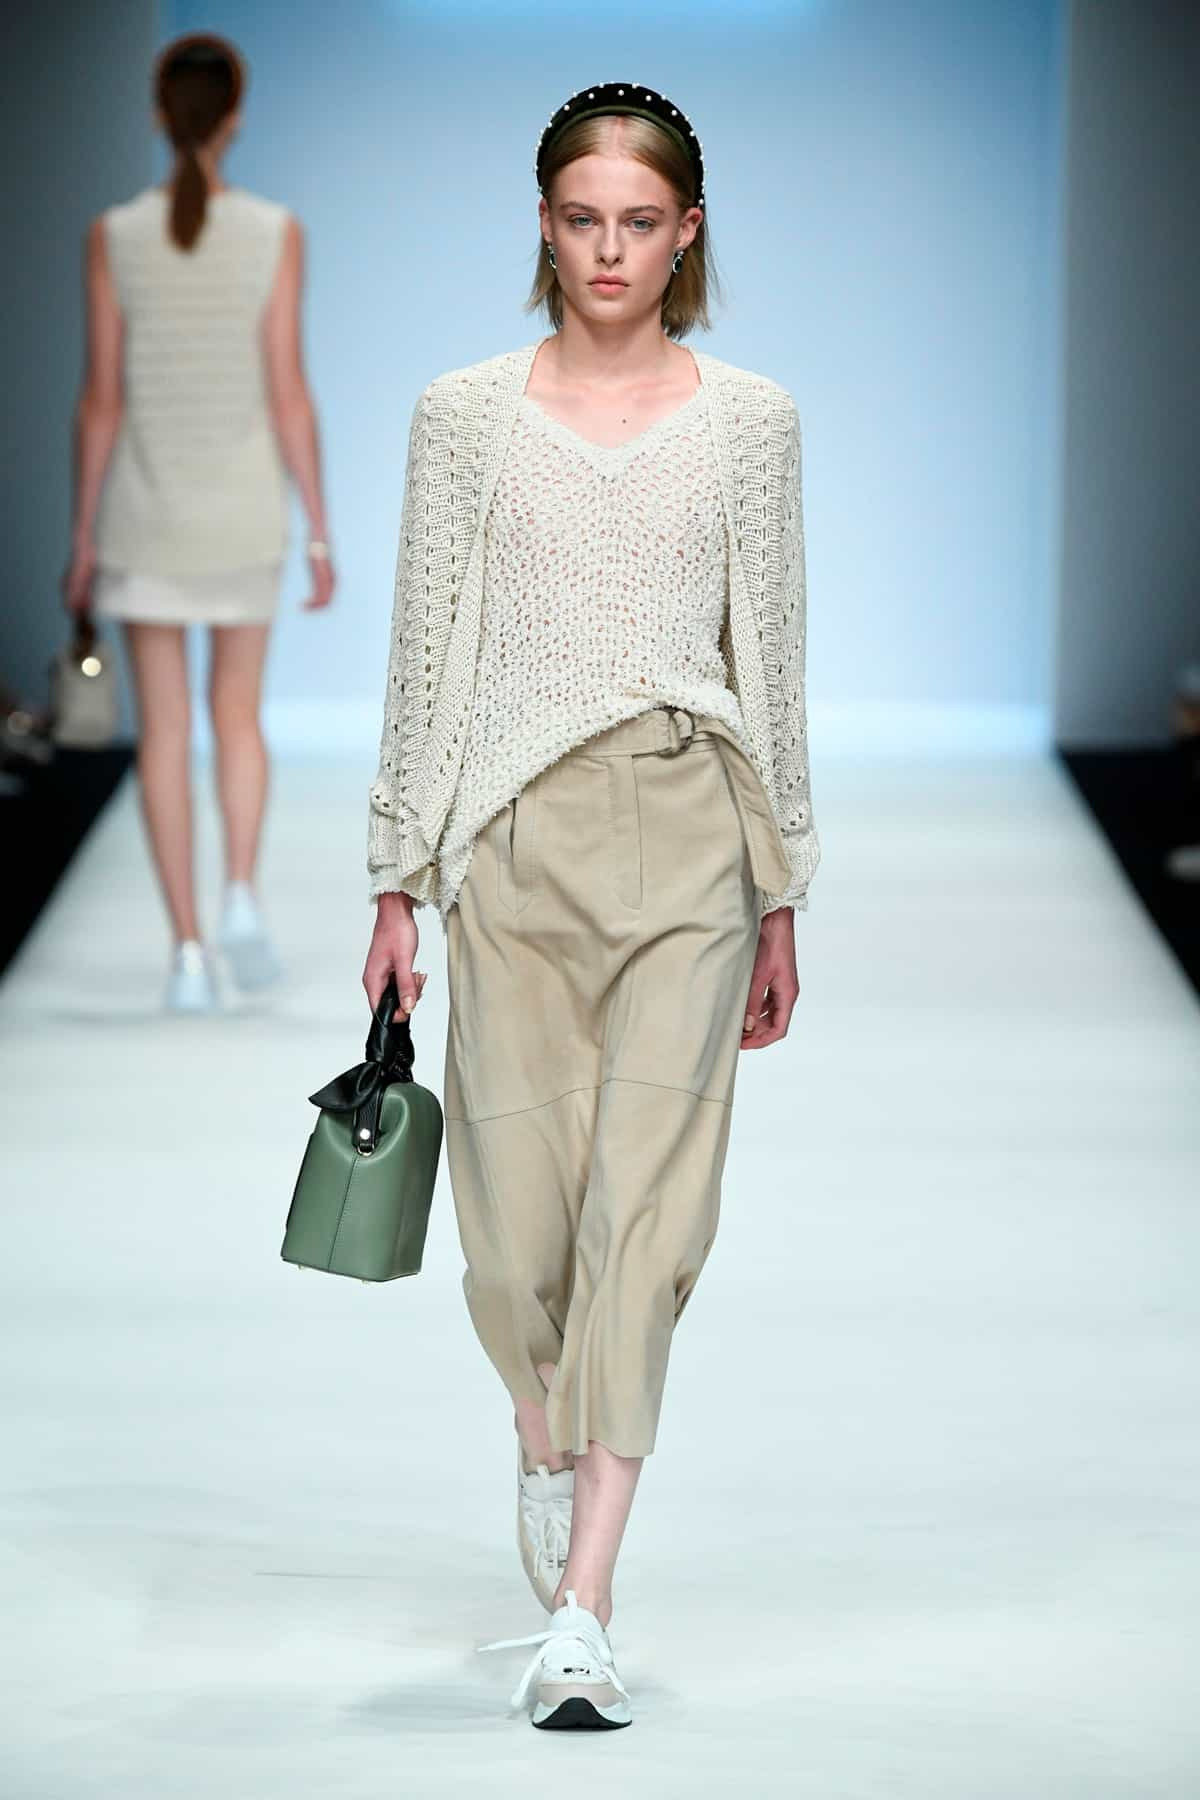 Sommer Mode 2020 Damen  2020 Fashion Trends 11 Spring